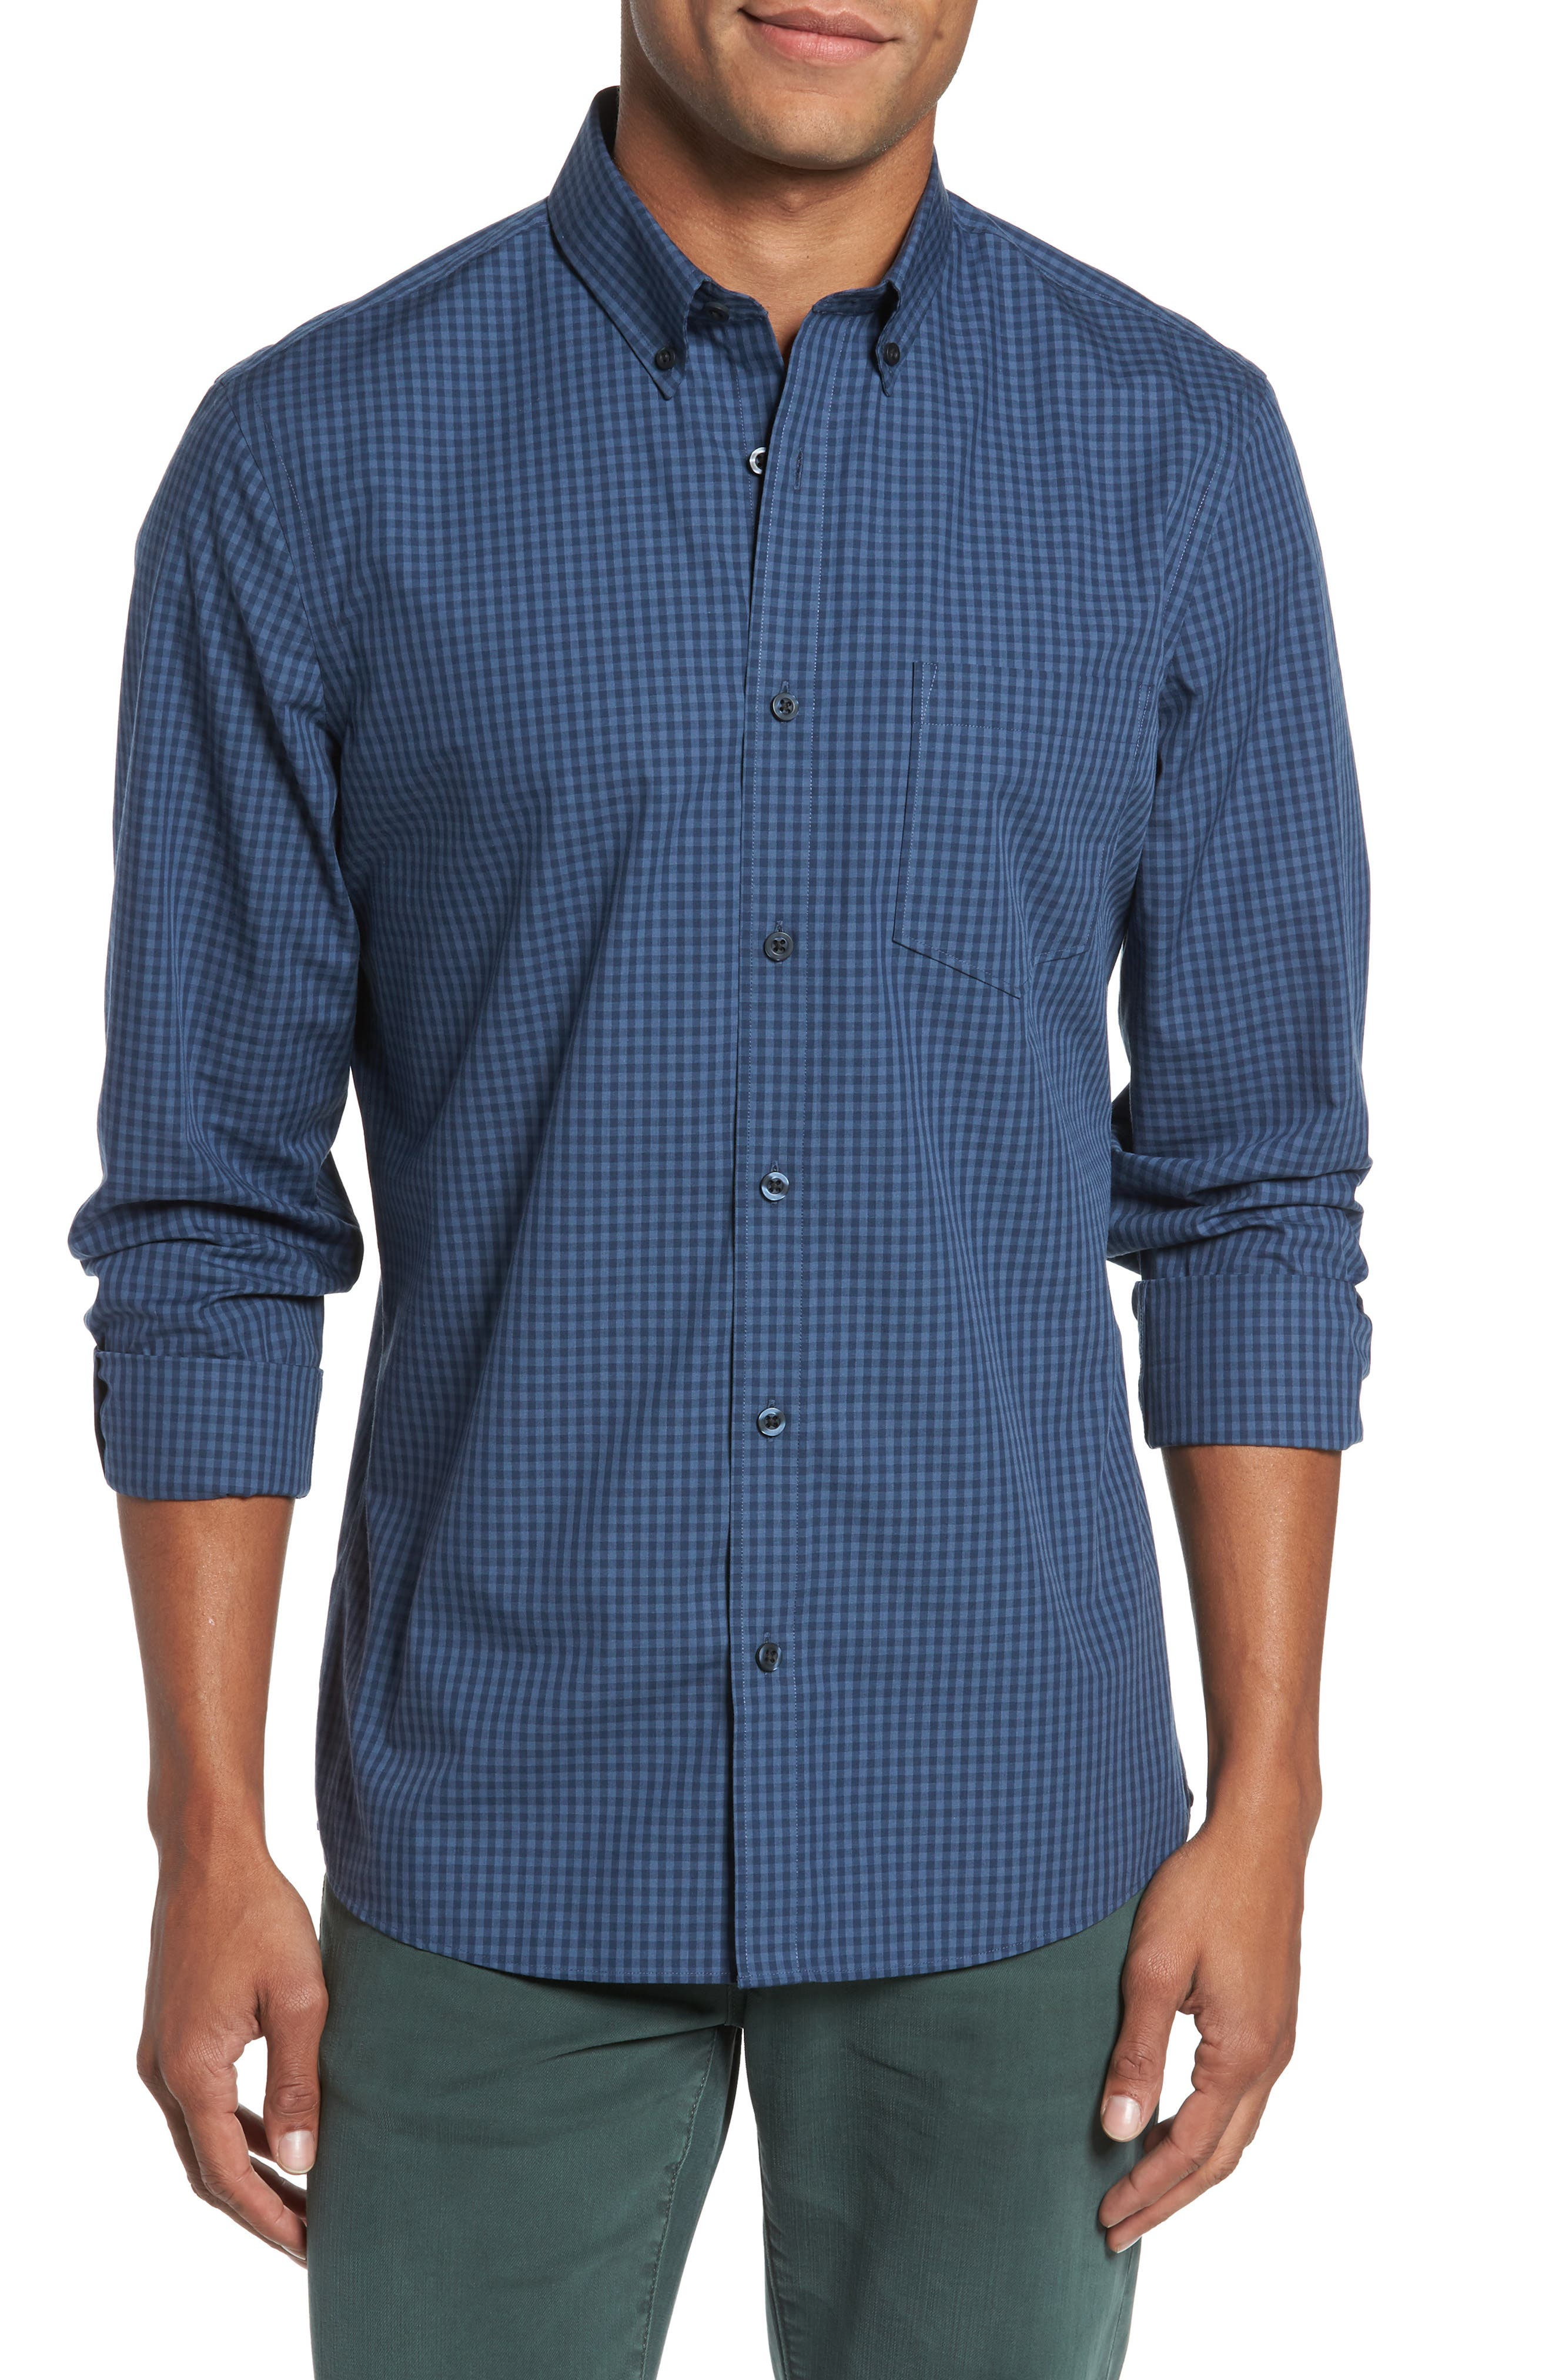 Main Image - Nordstrom Men's Shop Trim Fit Non-Iron Gingham Sport Shirt